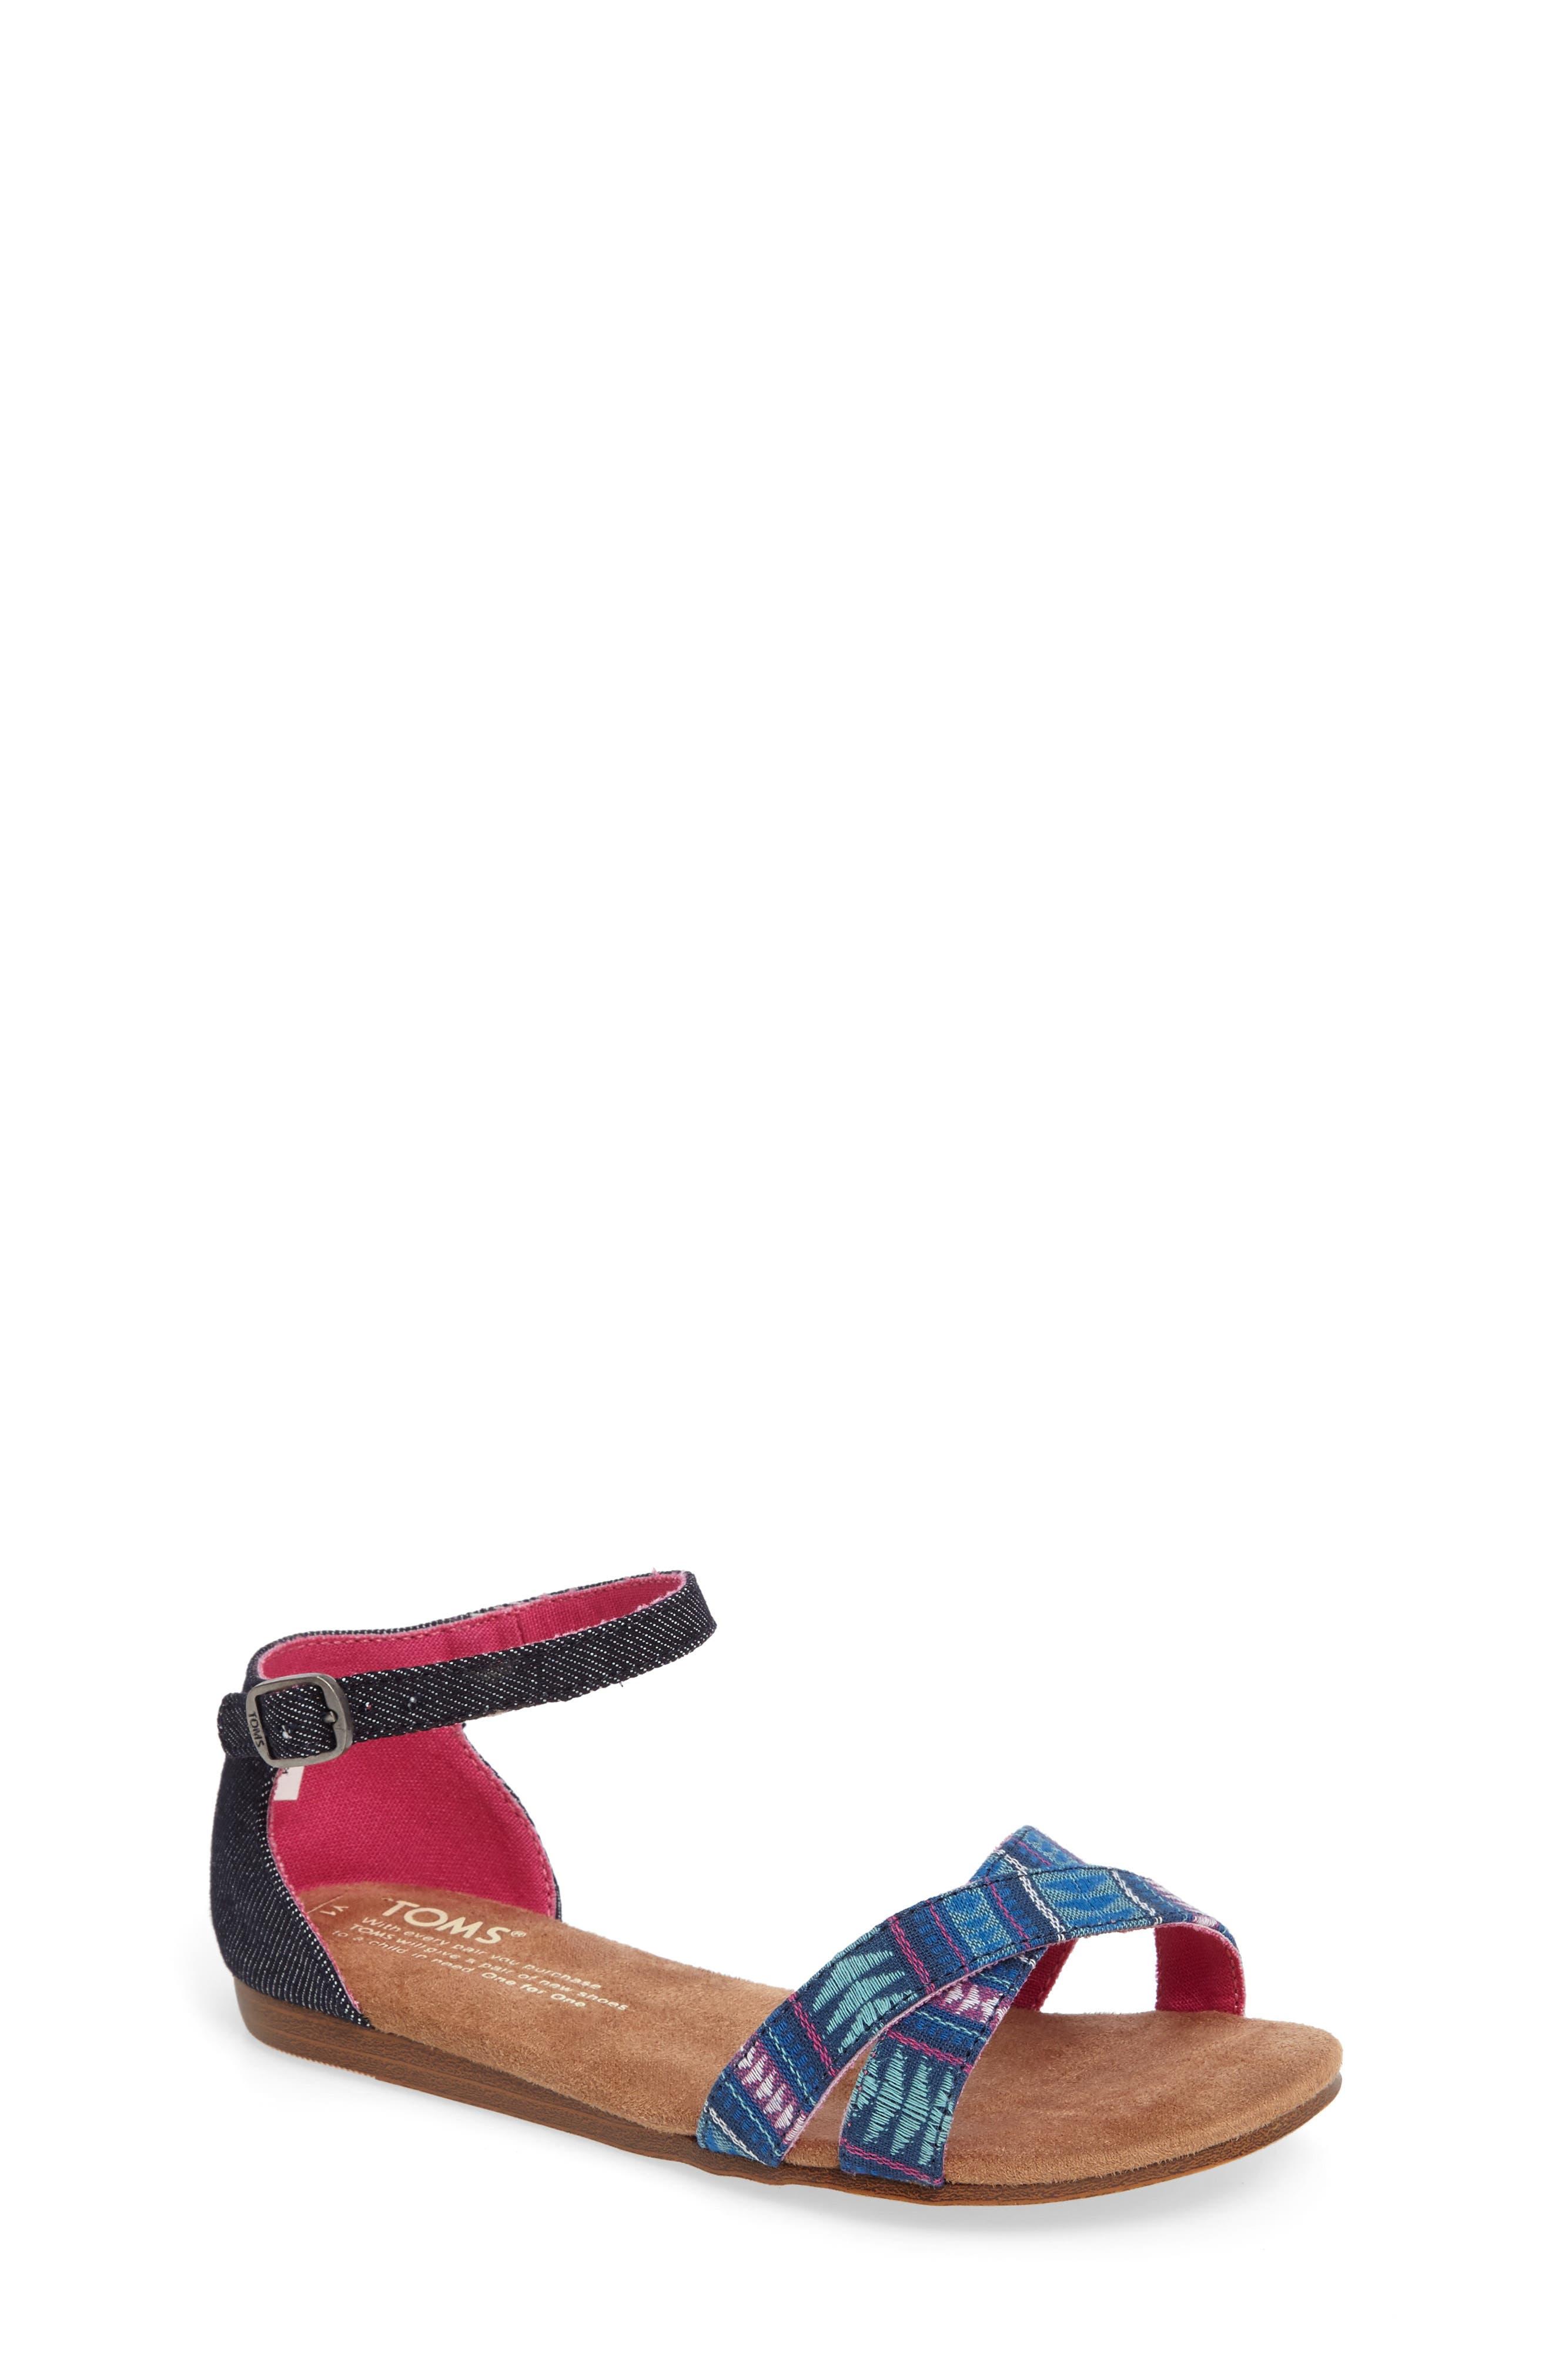 TOMS Correa Ankle Strap Sandal